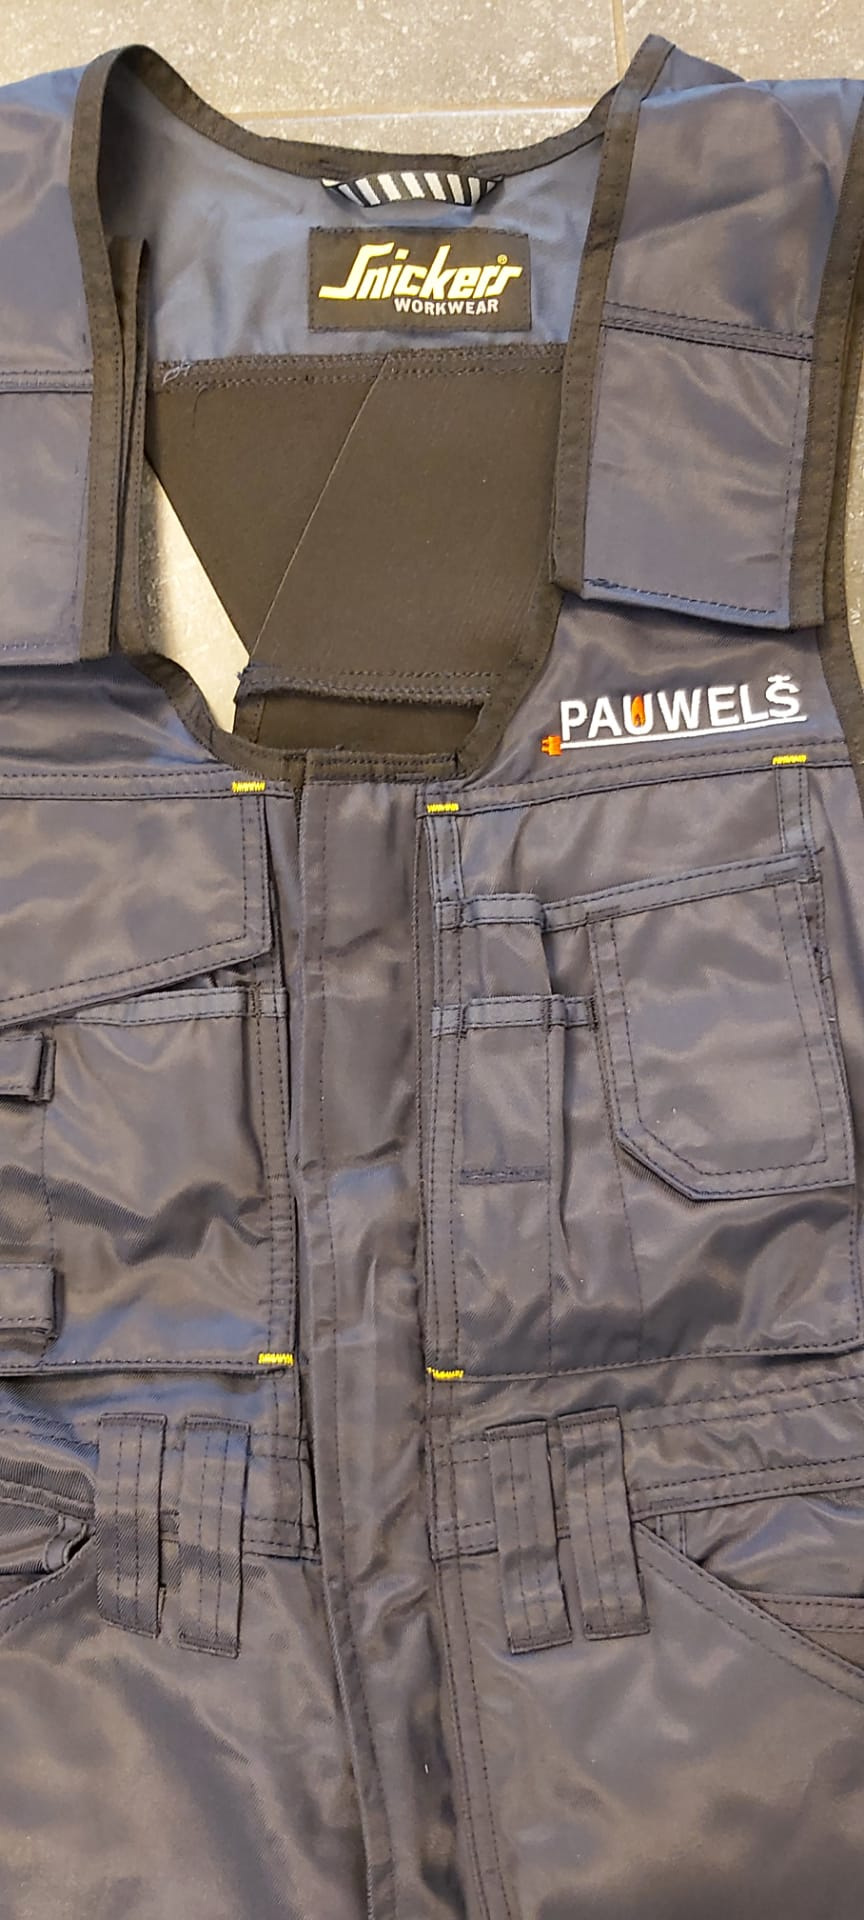 geborduurd logo Pauwels